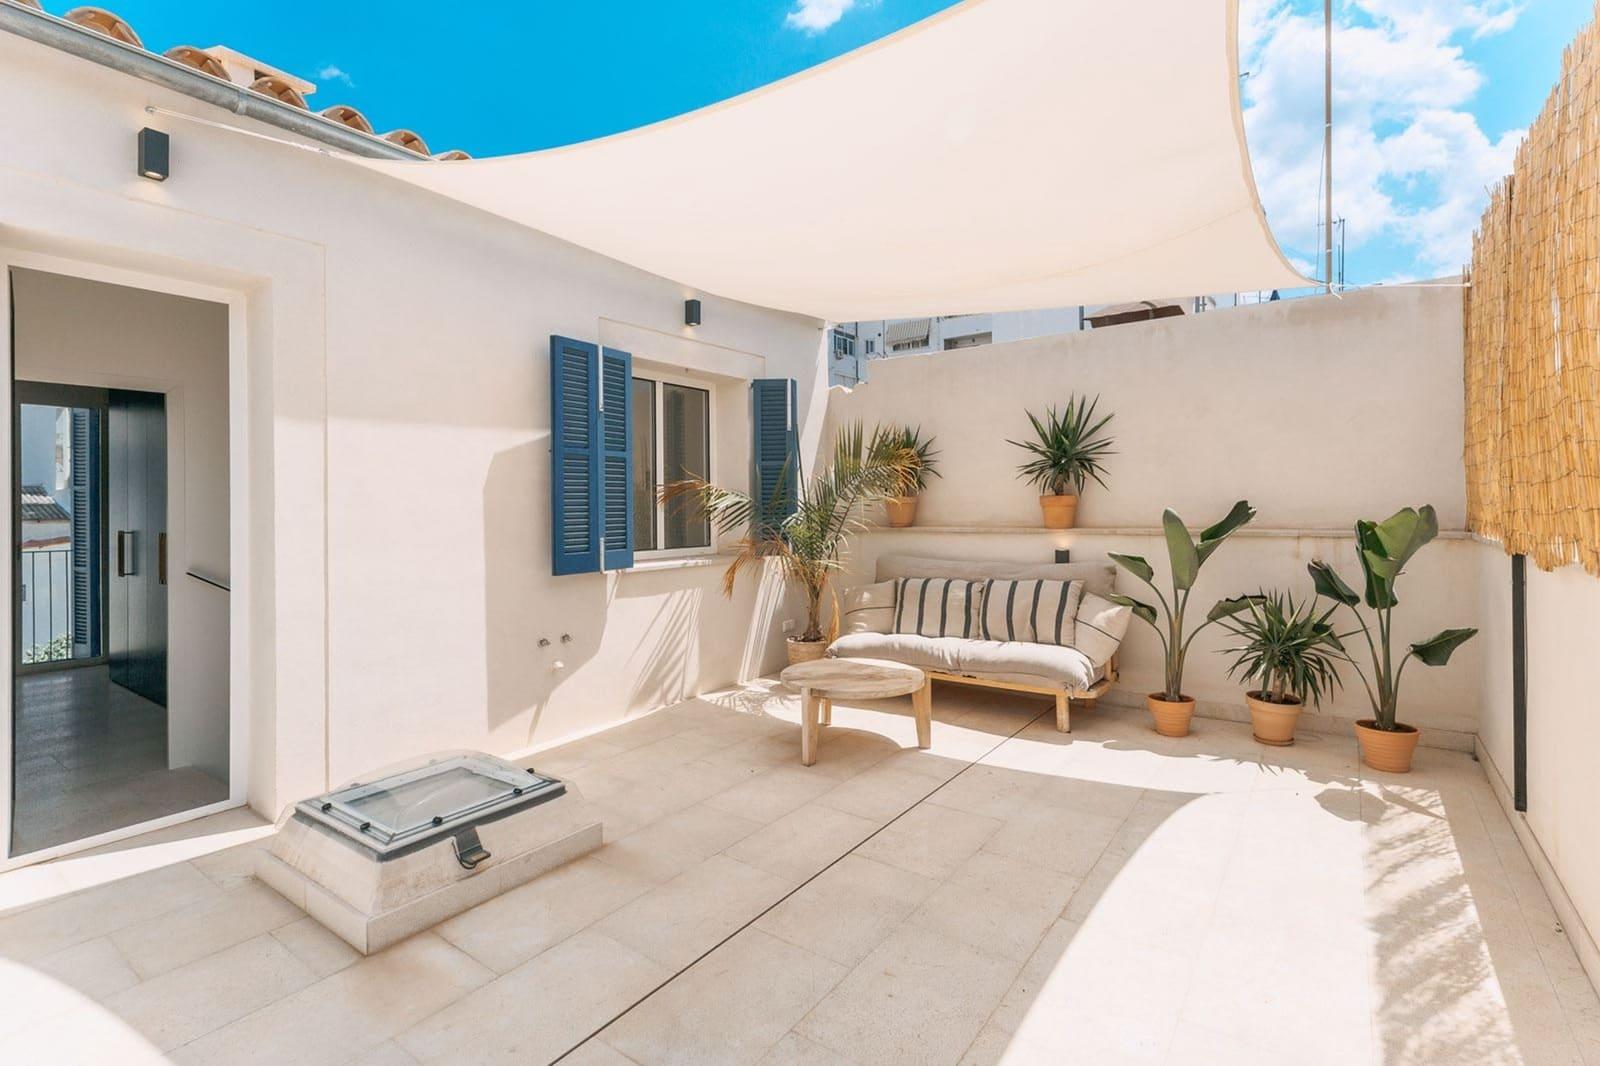 6 bedroom Townhouse for sale in Palma de Mallorca - € 1,850,000 (Ref: 6324663)